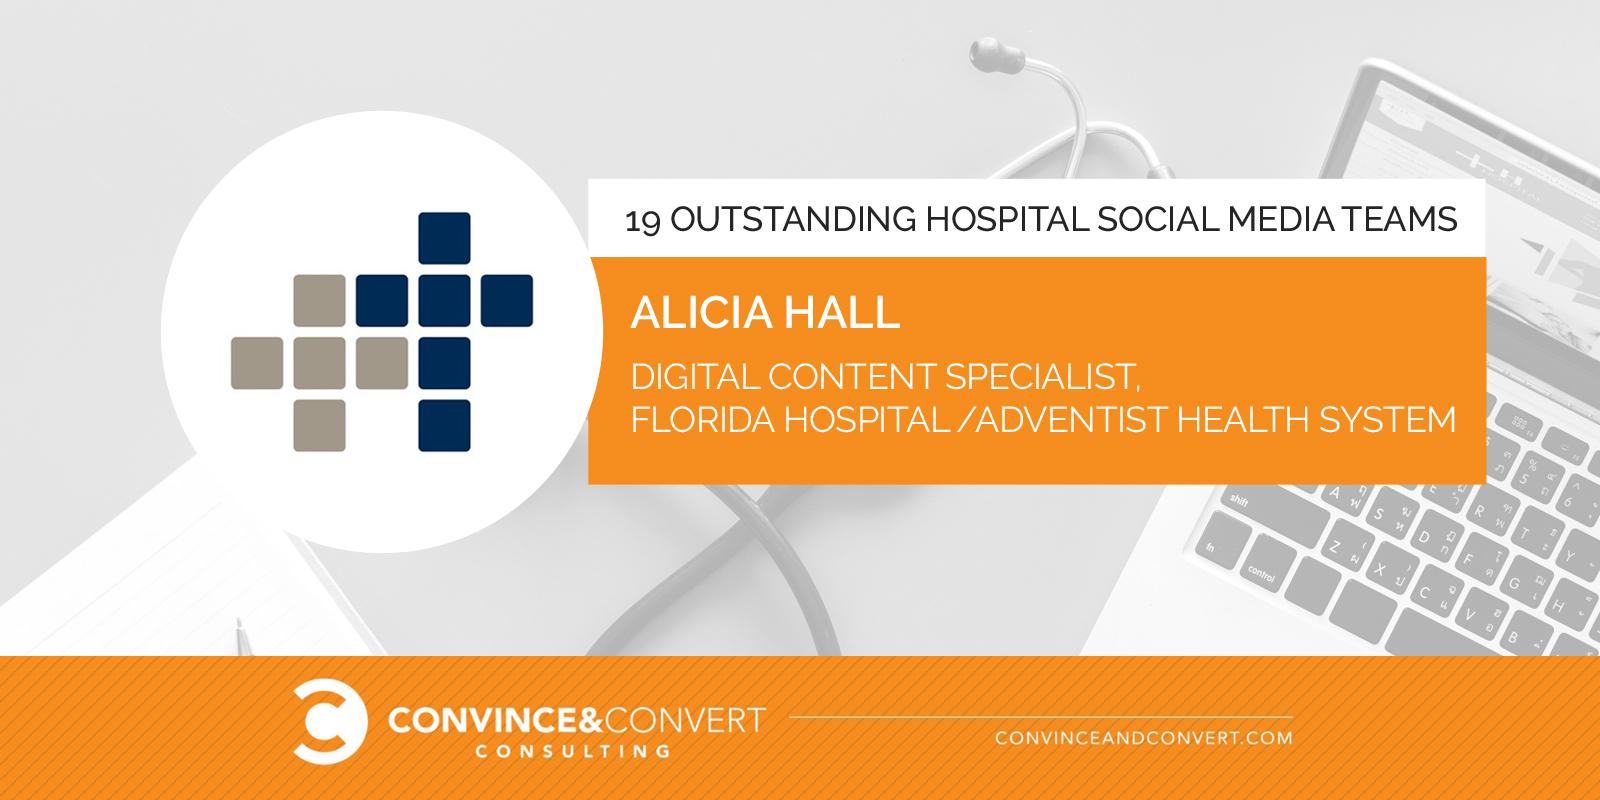 Hall-Alicia